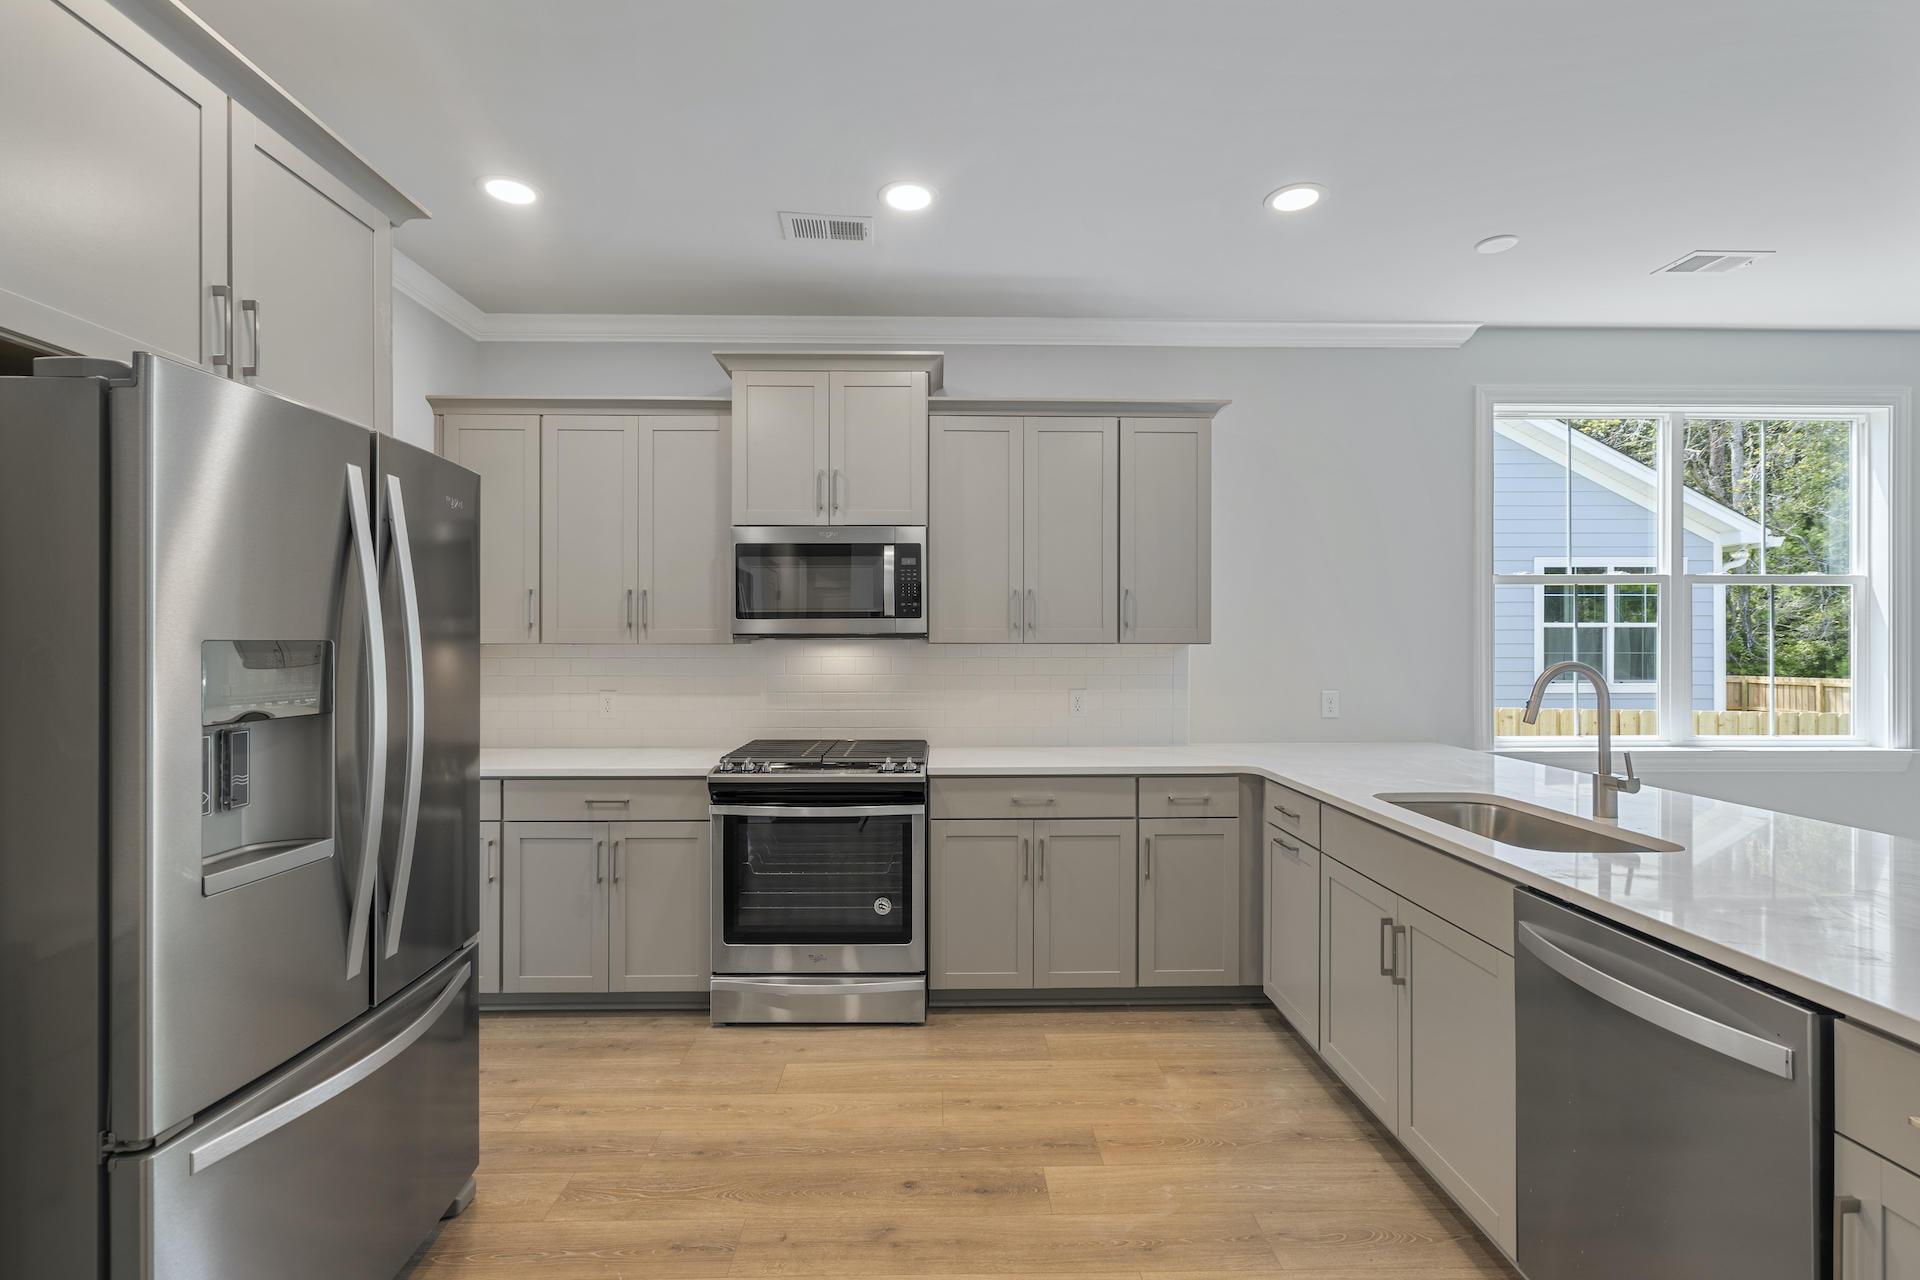 Drayton Oaks Homes For Sale - 105 Plowden Mill, Summerville, SC - 23